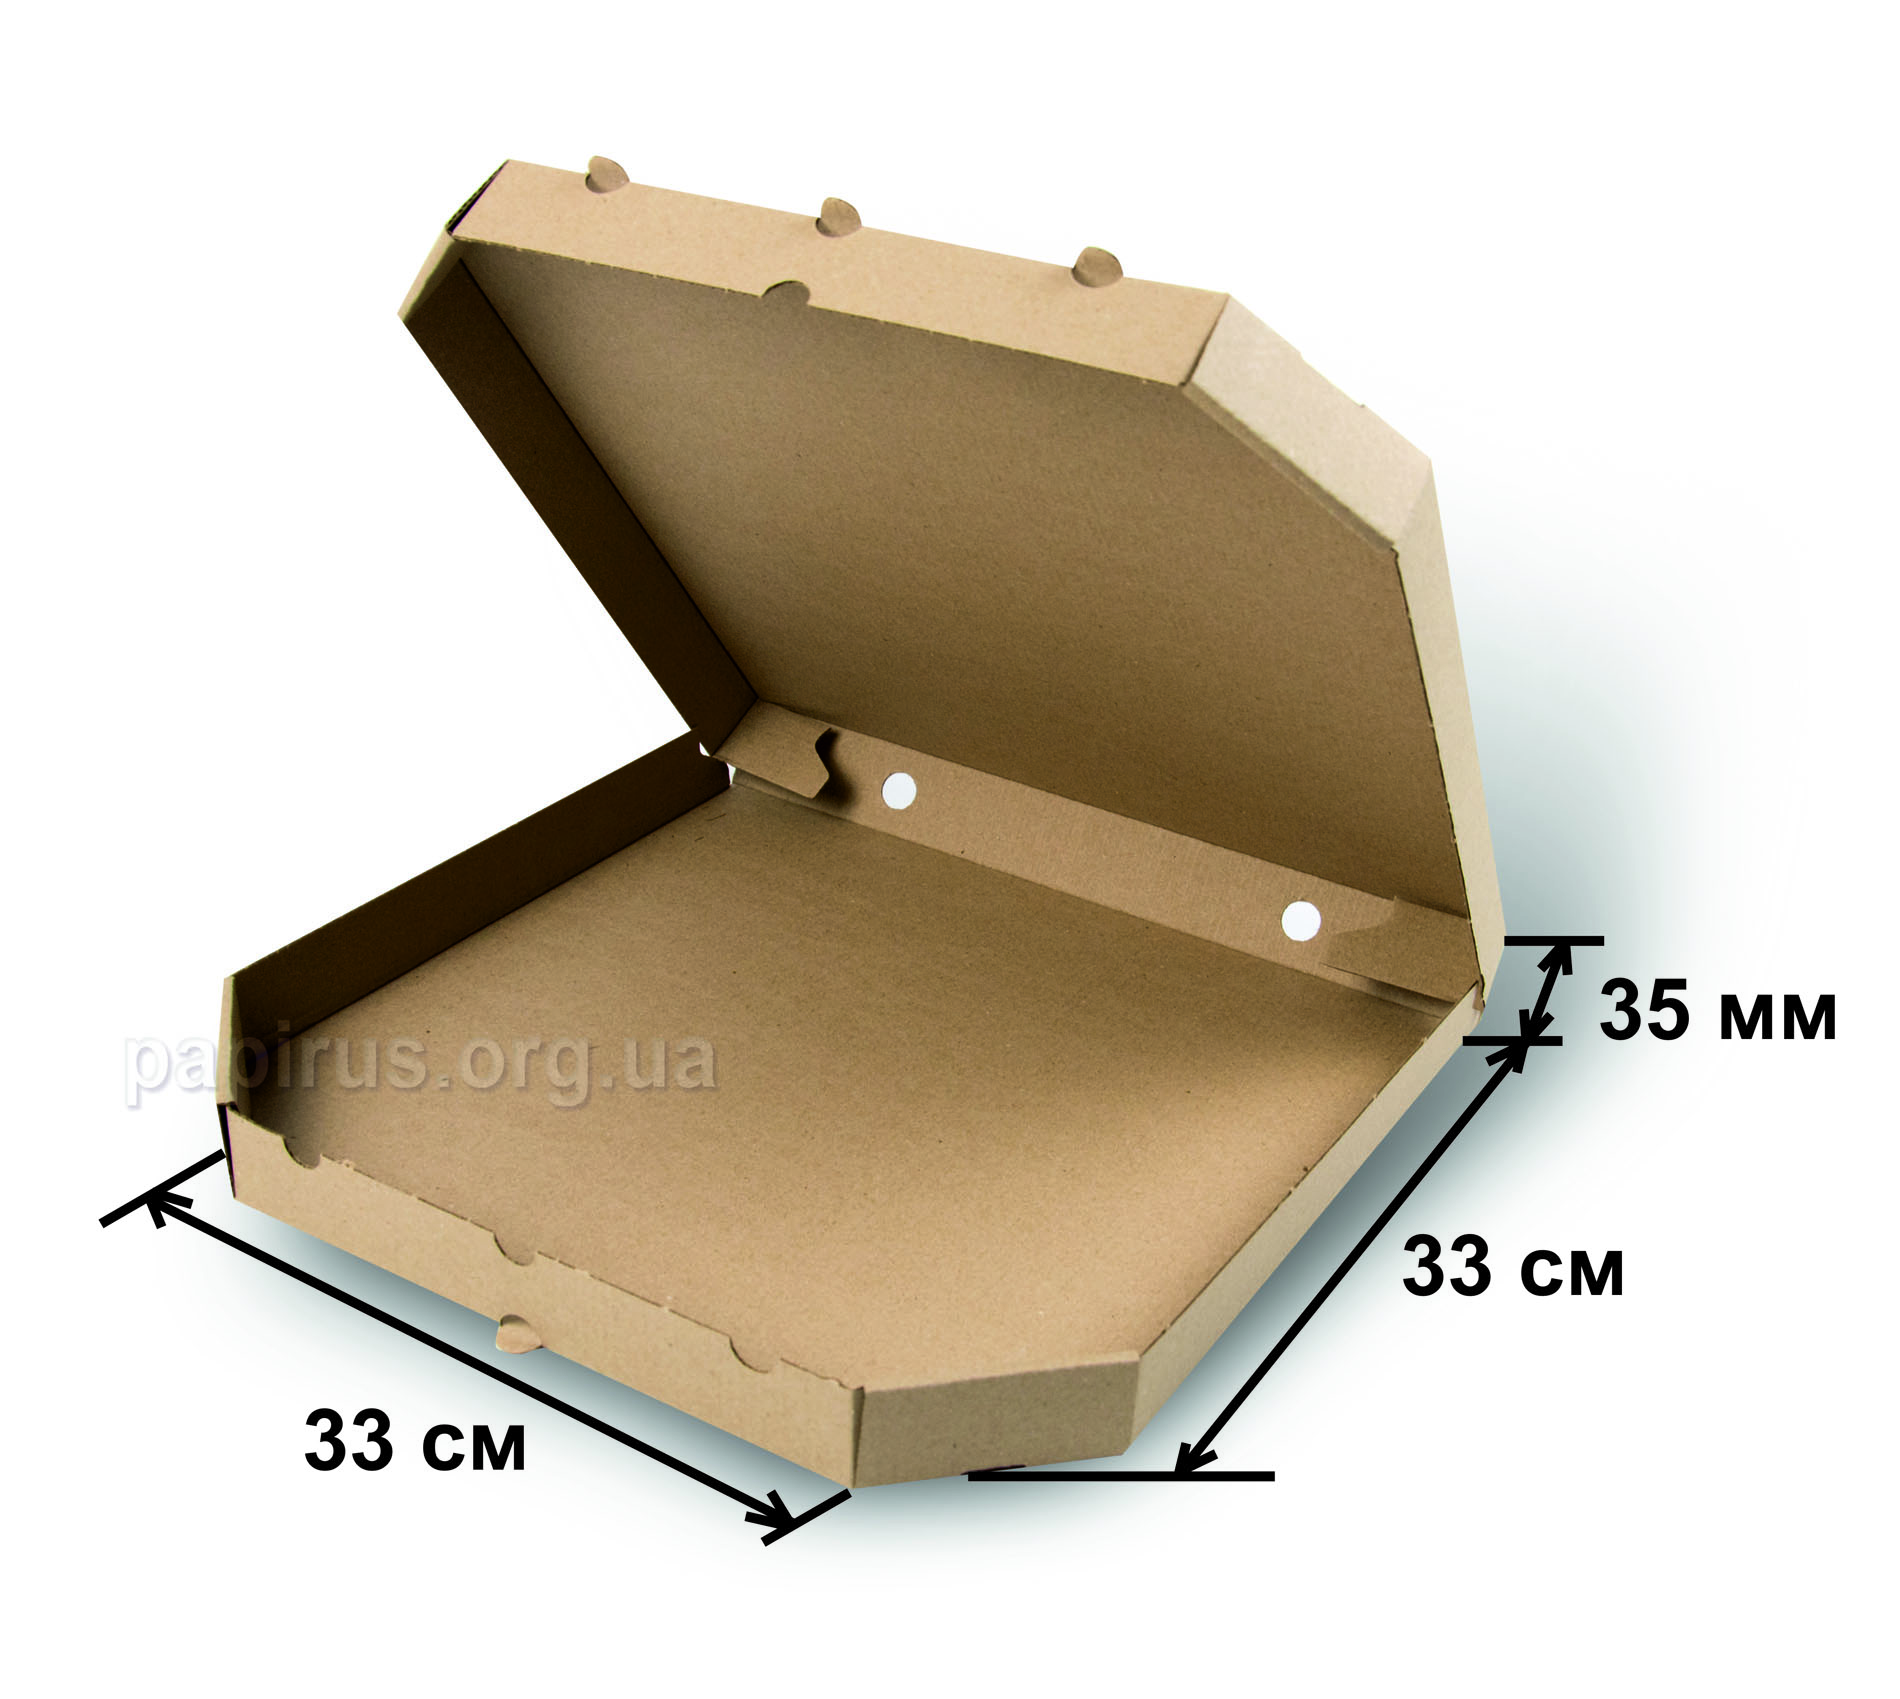 Коробка для пиццы бурая 330х330, г.Сумы, Типография Папирус